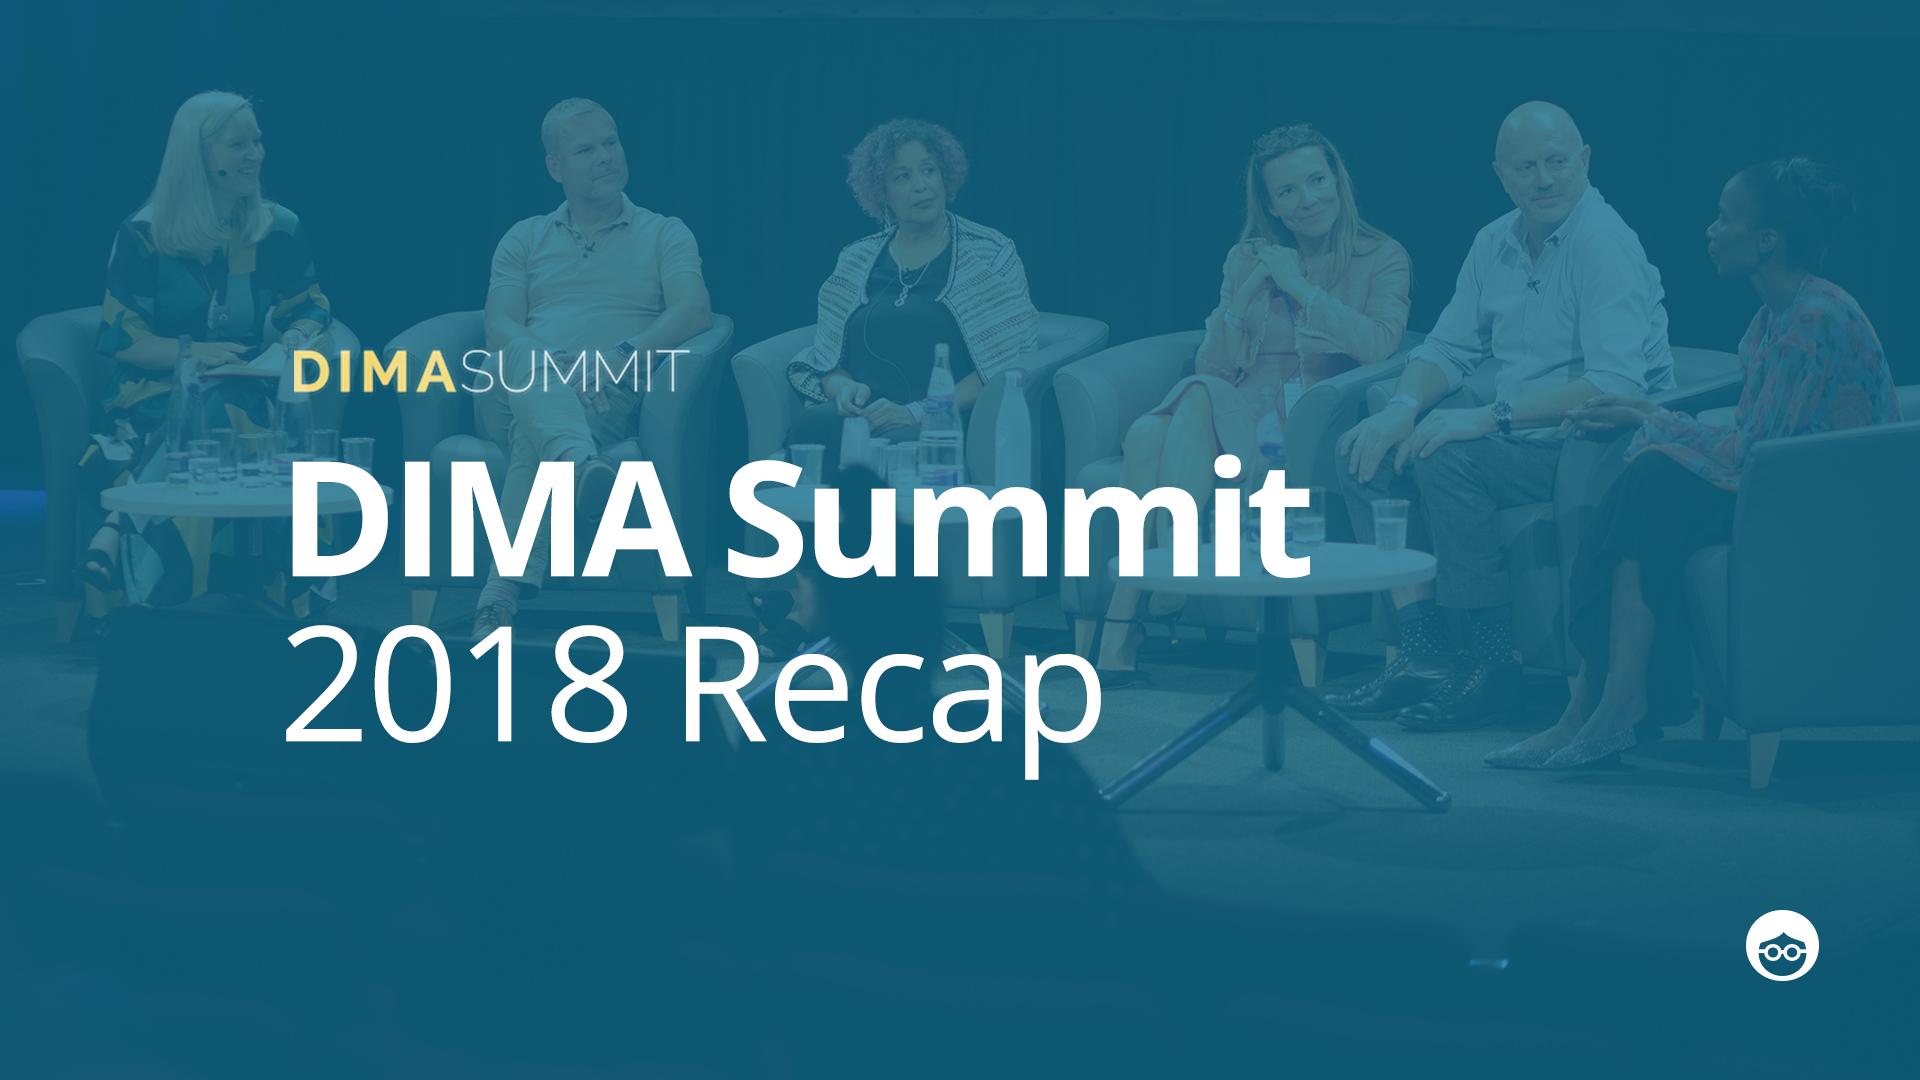 DIMA Summit